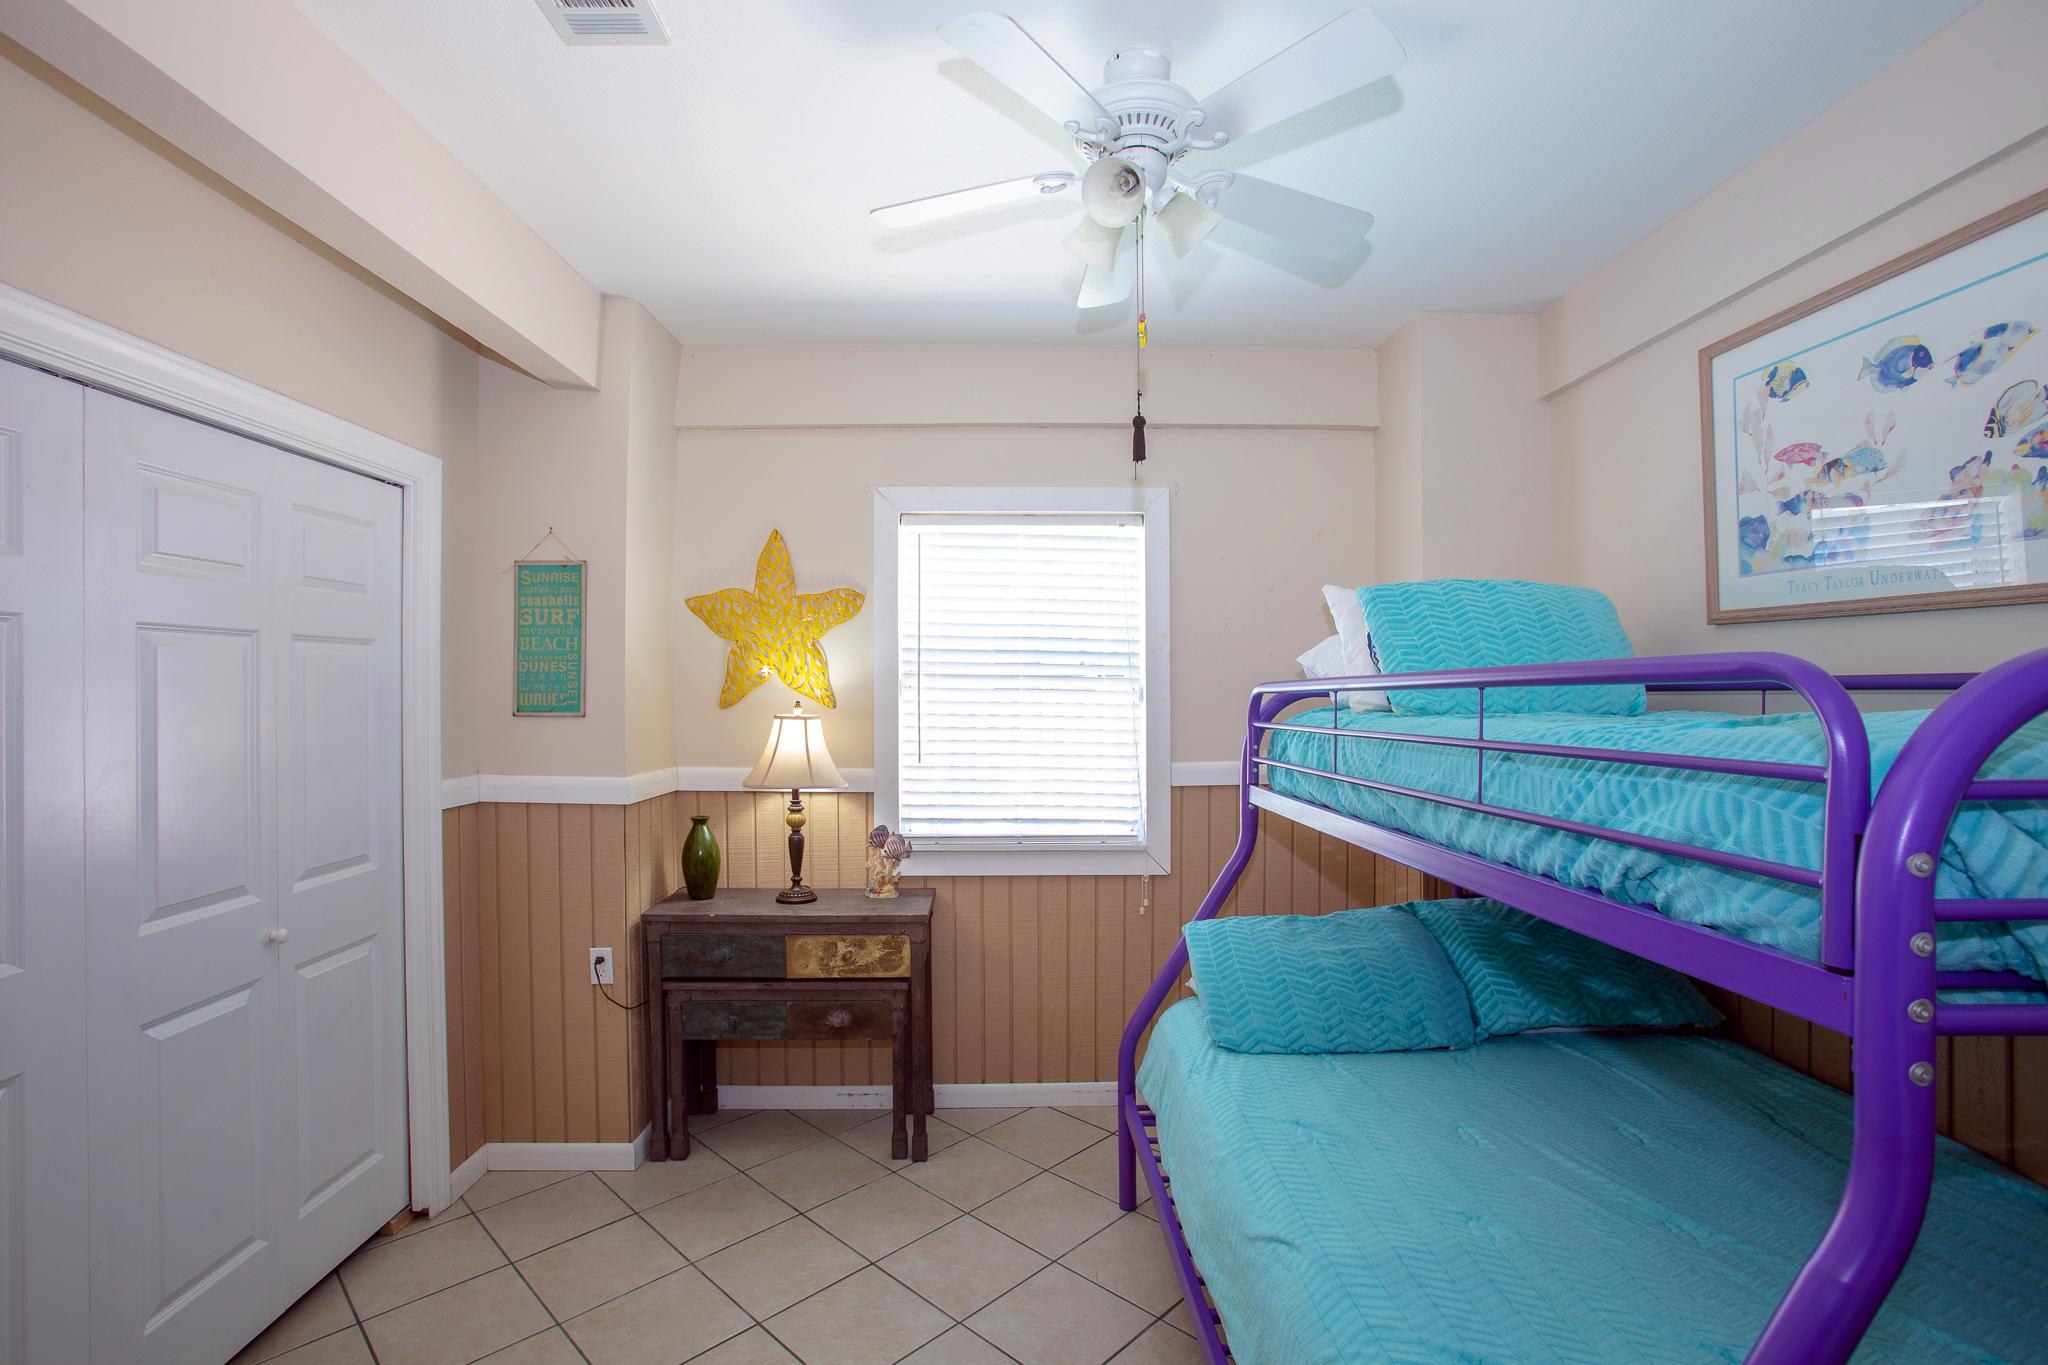 Maldonado 1015 - Sea the Big Picture House/Cottage rental in Pensacola Beach House Rentals in Pensacola Beach Florida - #23